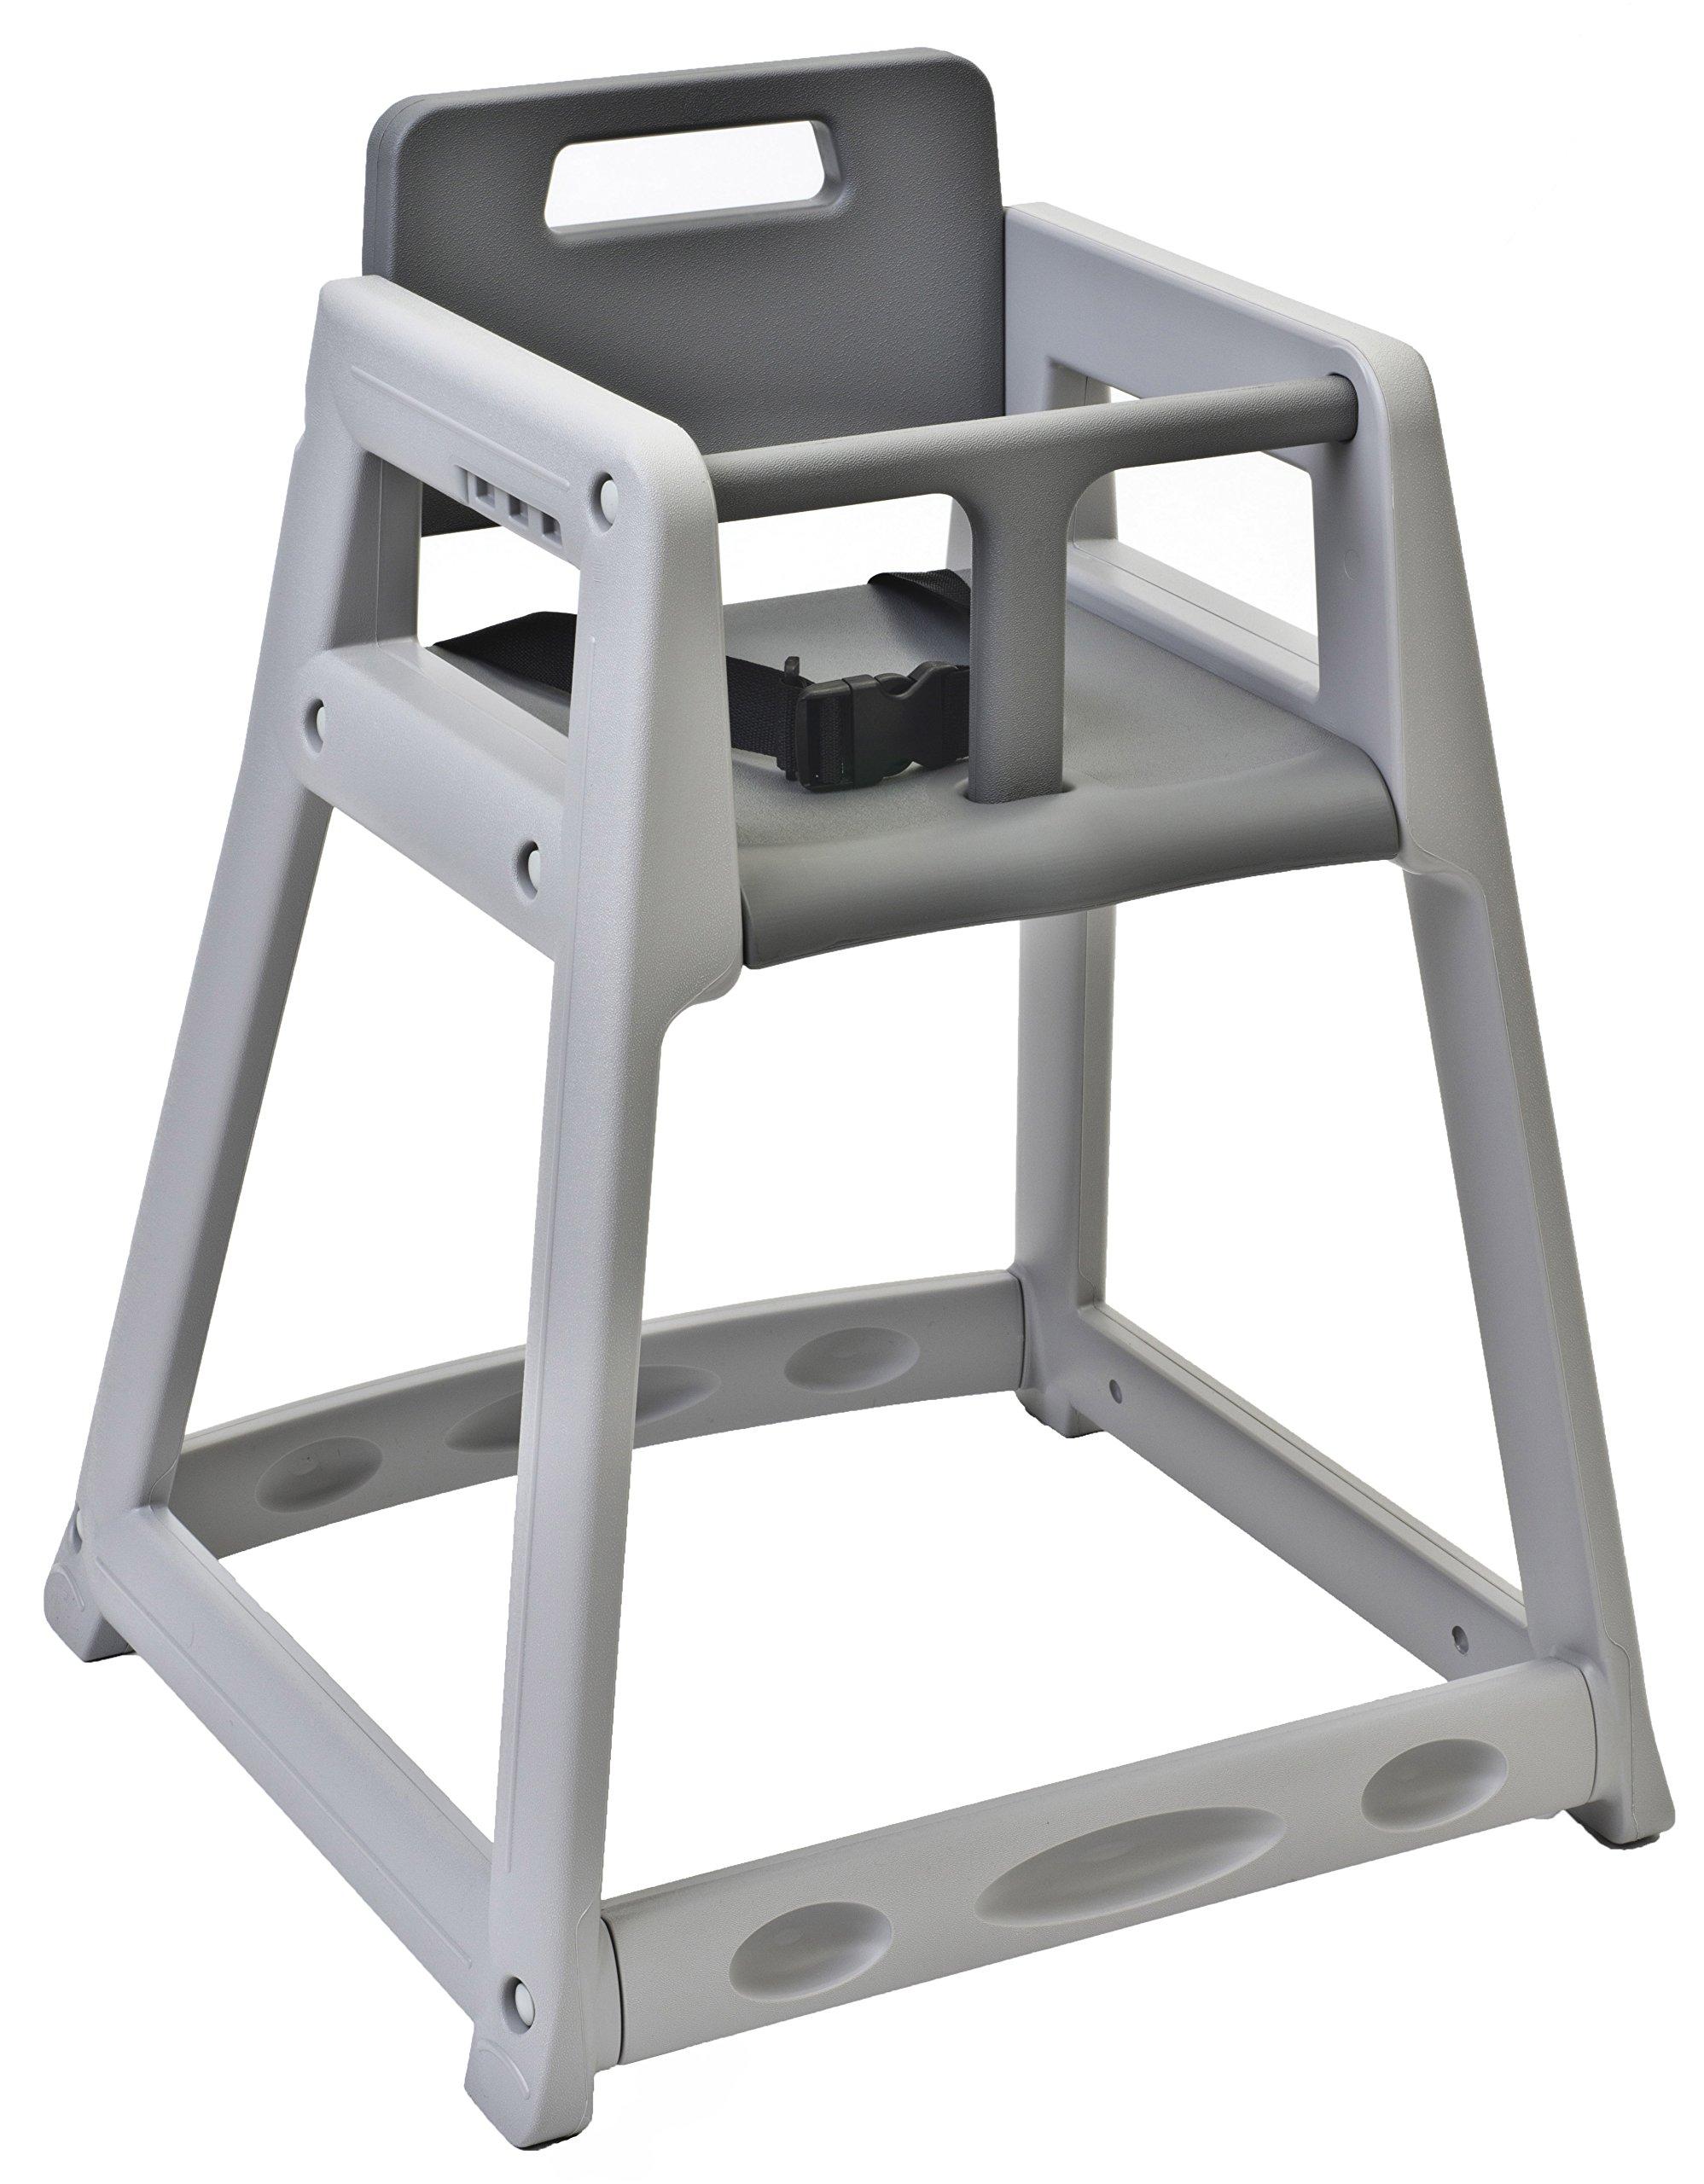 Koala Kare KB850-01 Diner Plastic High Chair, Grey , 23'' Height, 23'' width, 30'' Length